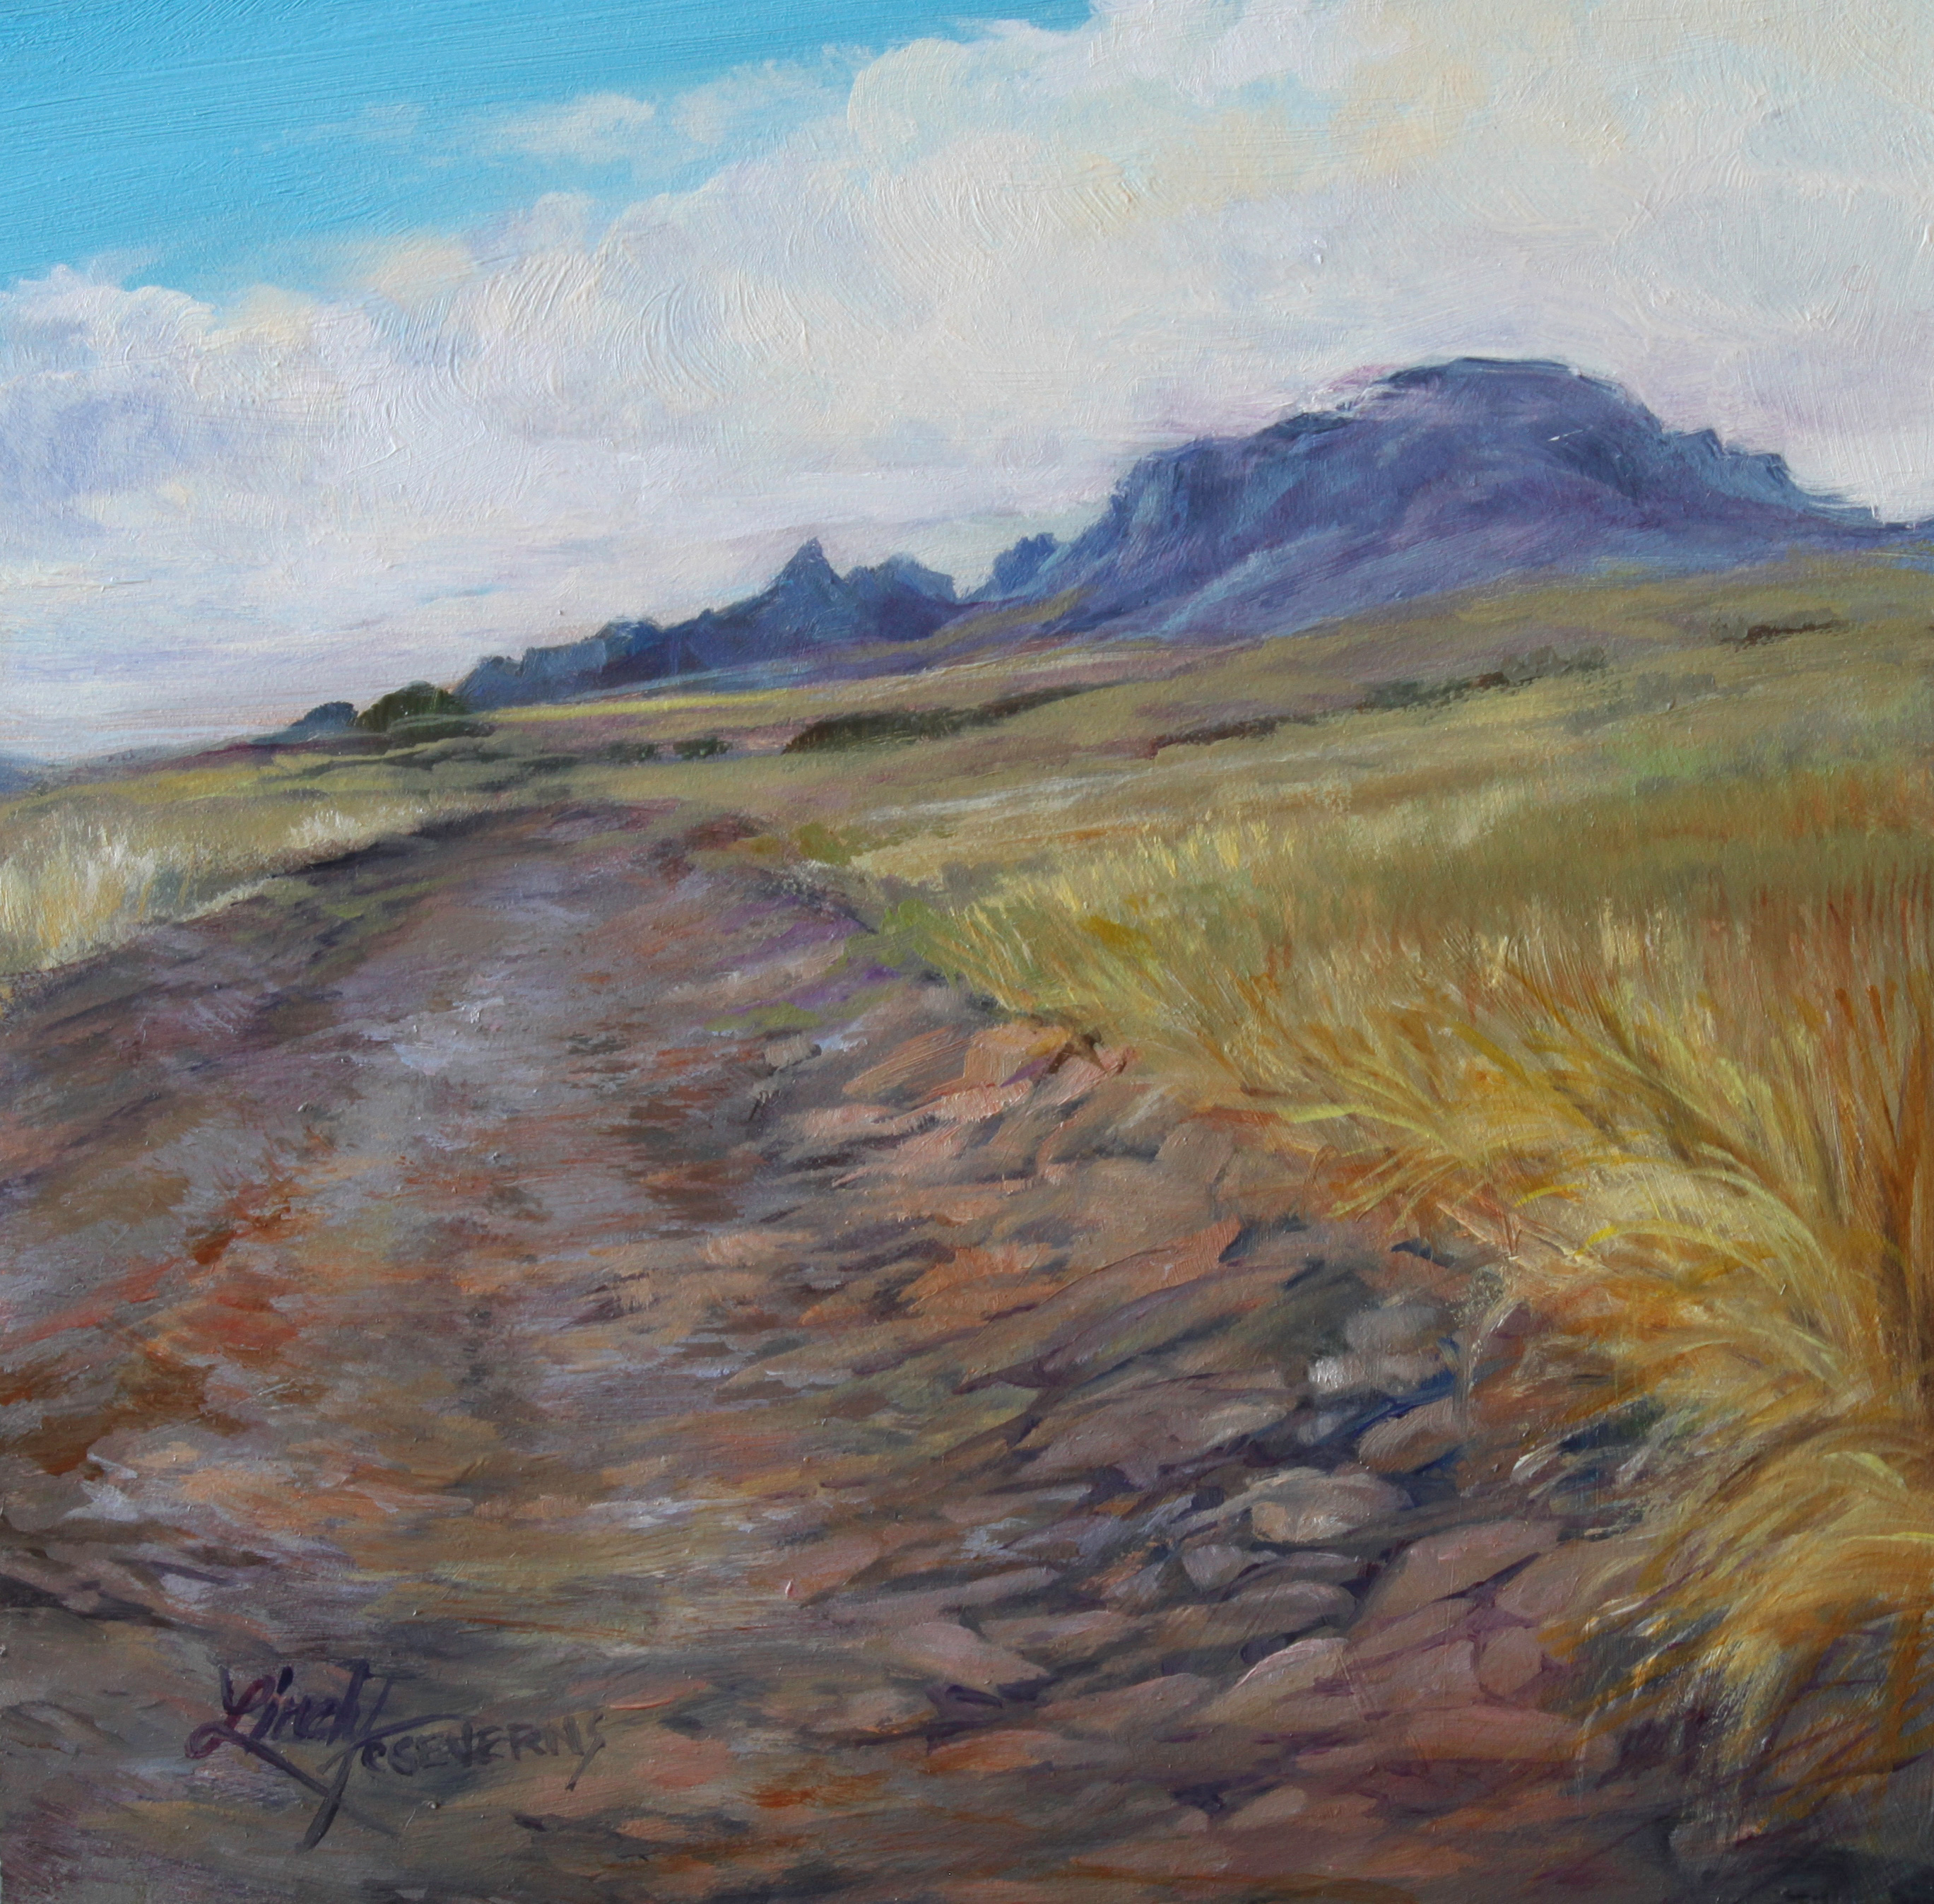 27g15 the rocky road to chinati 6x6 oil lindy c severns edit dzj1rg